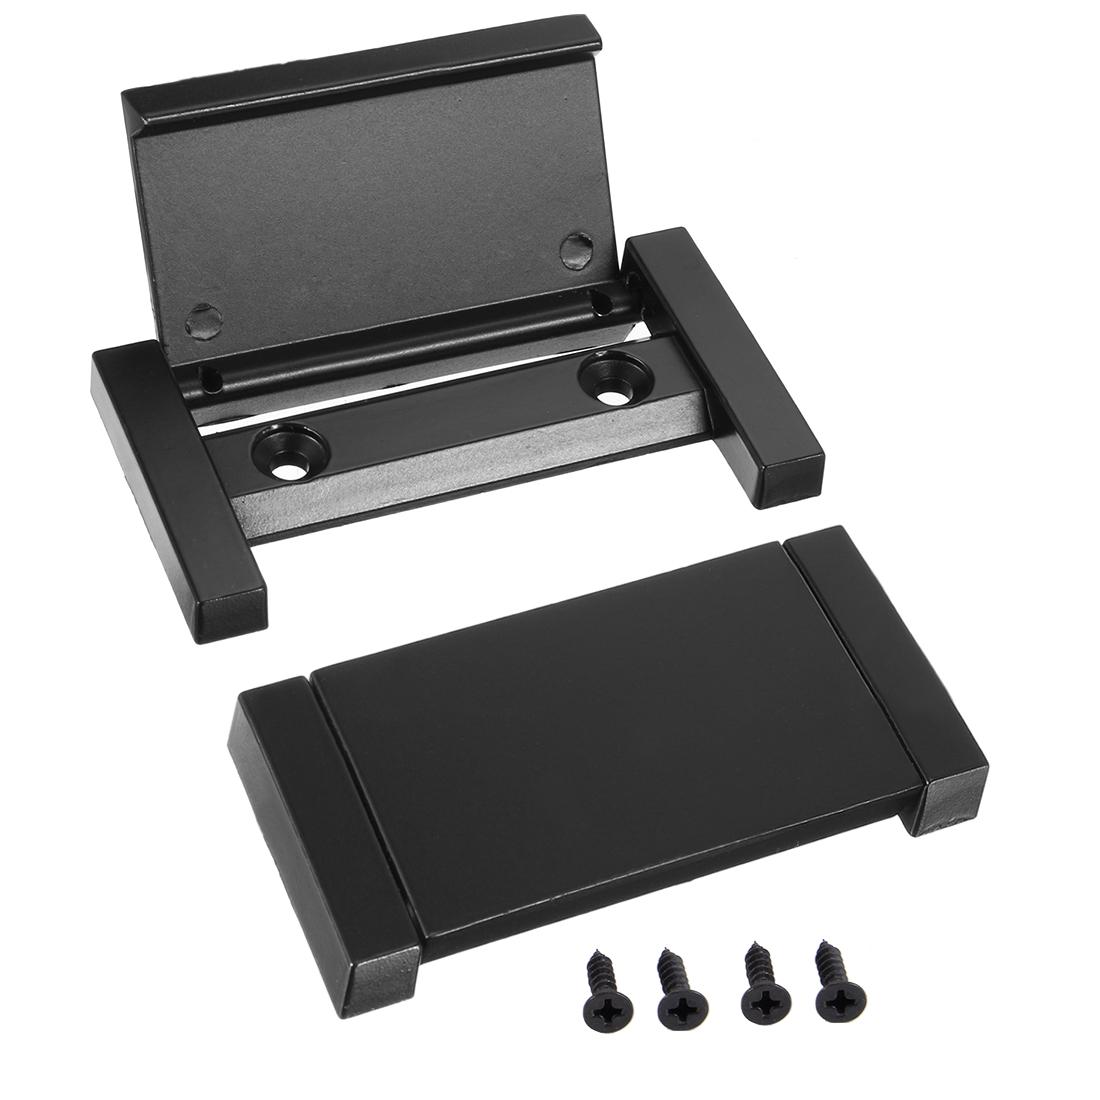 Cupboard Zinc Alloy Pull Handle 2-1/2 Inch Hole Centers Flat Black 2pcs